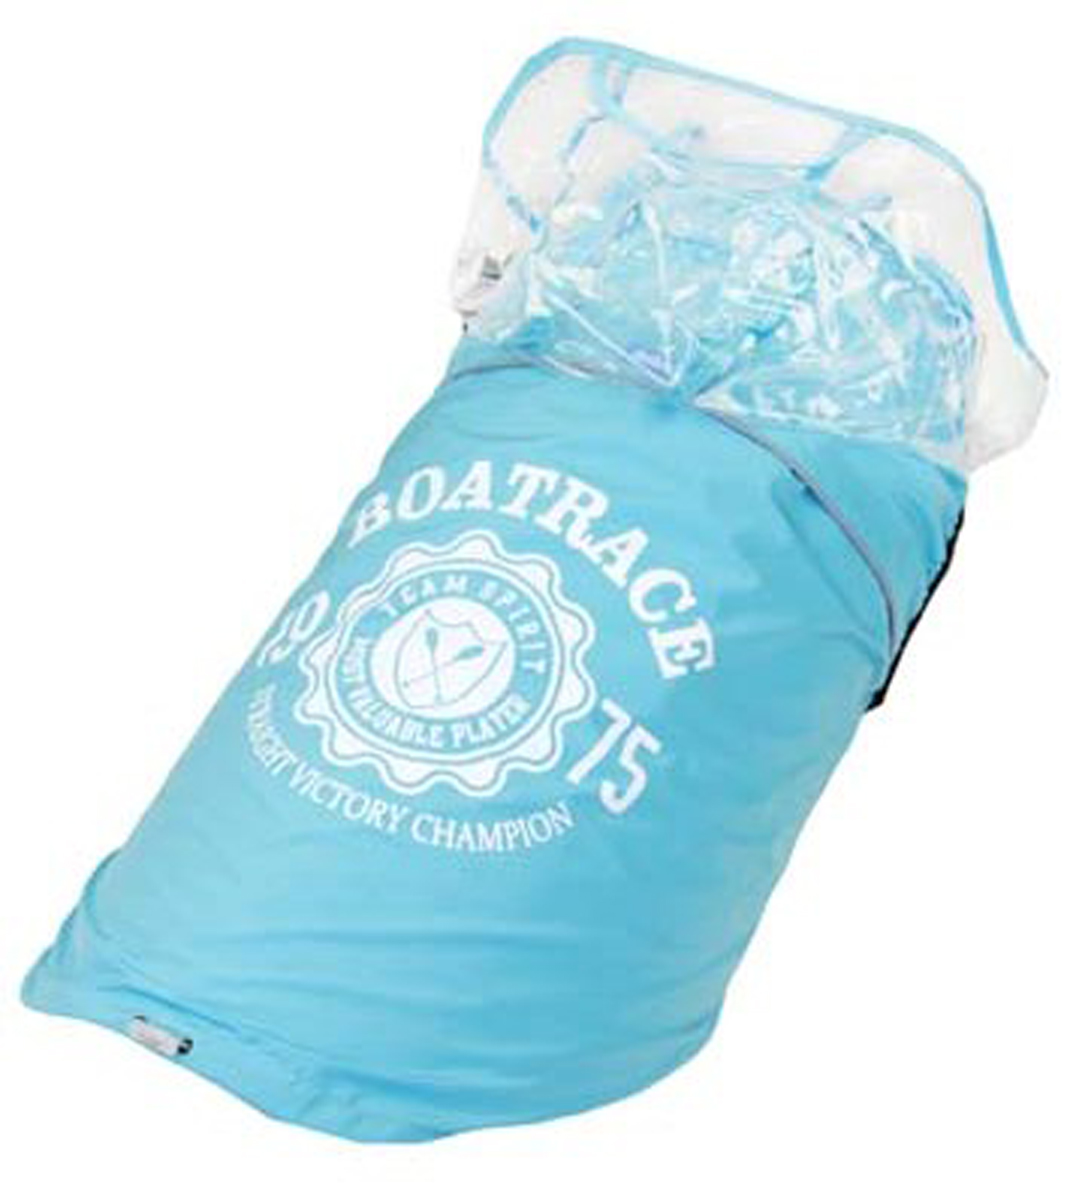 Куртка для собак Dobaz, водонепроницаемая, цвет: прозрачно-синий. ДА13033Д4ХЛ. Размер 4XL